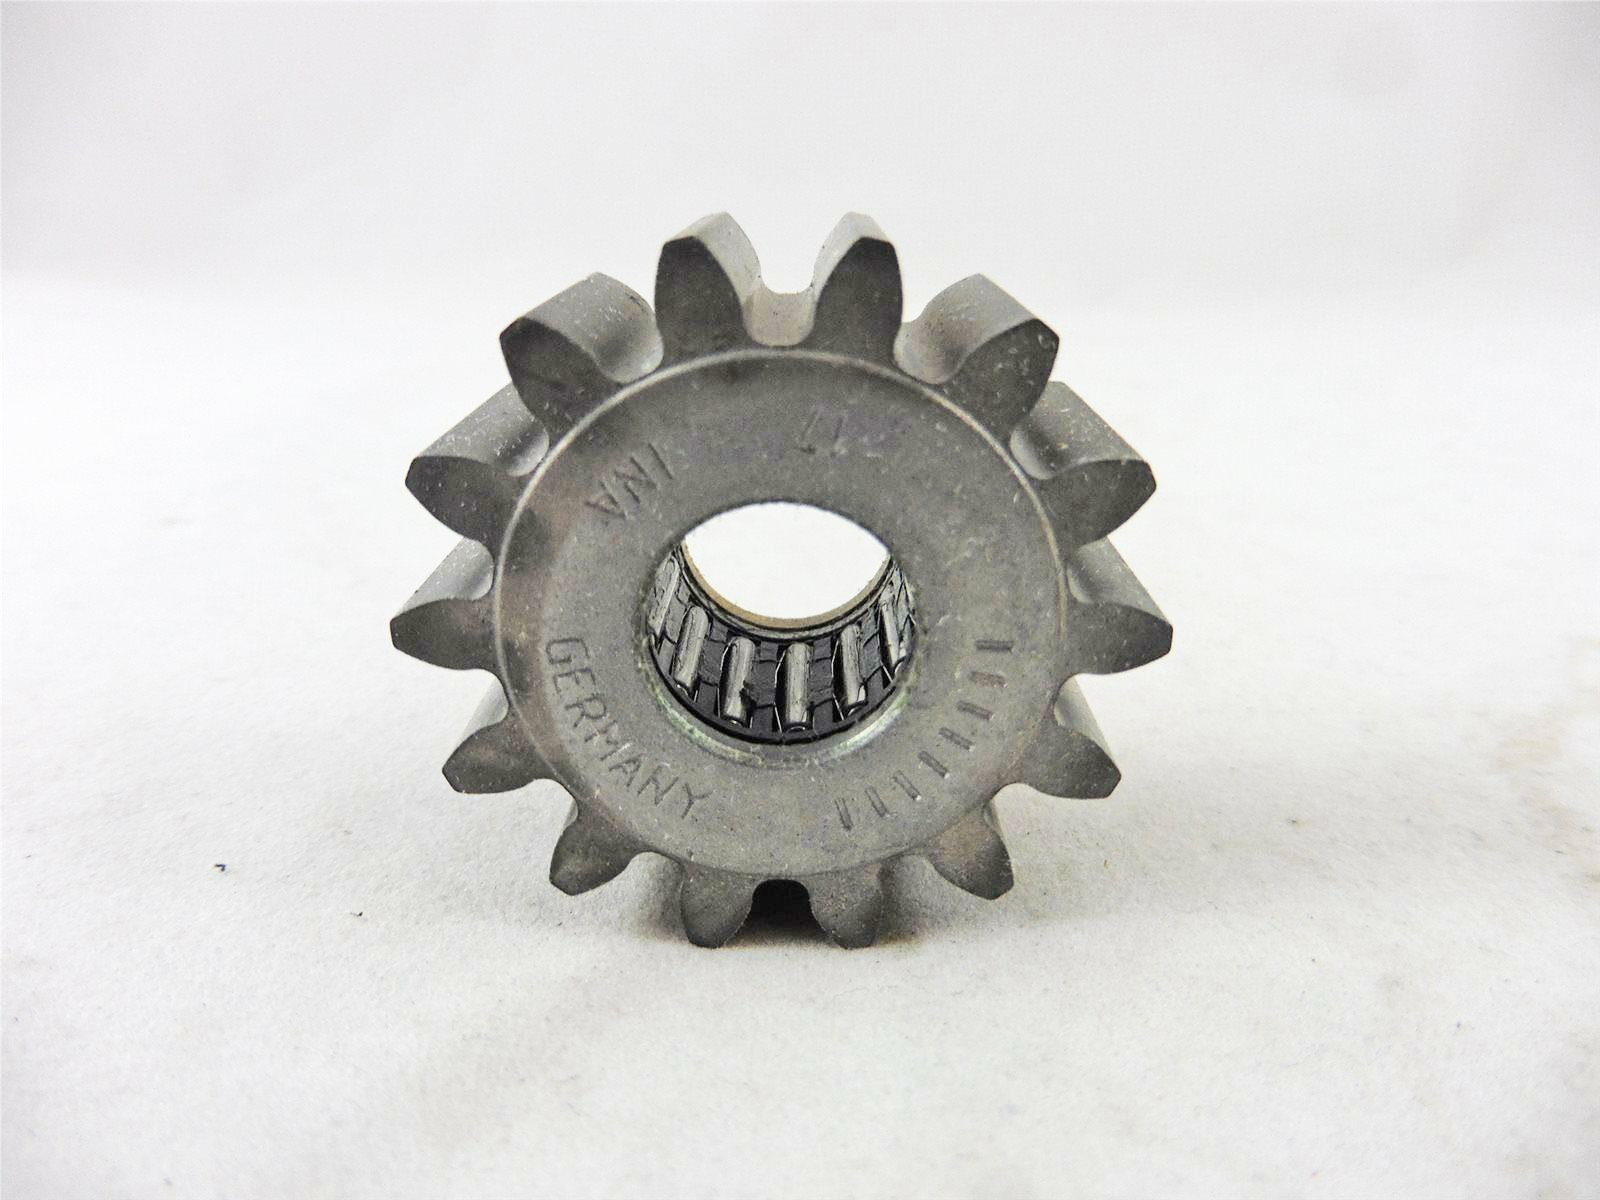 43 CM Messer SABO John Deere Classic Economy Standard Turbostar SA15166 31135